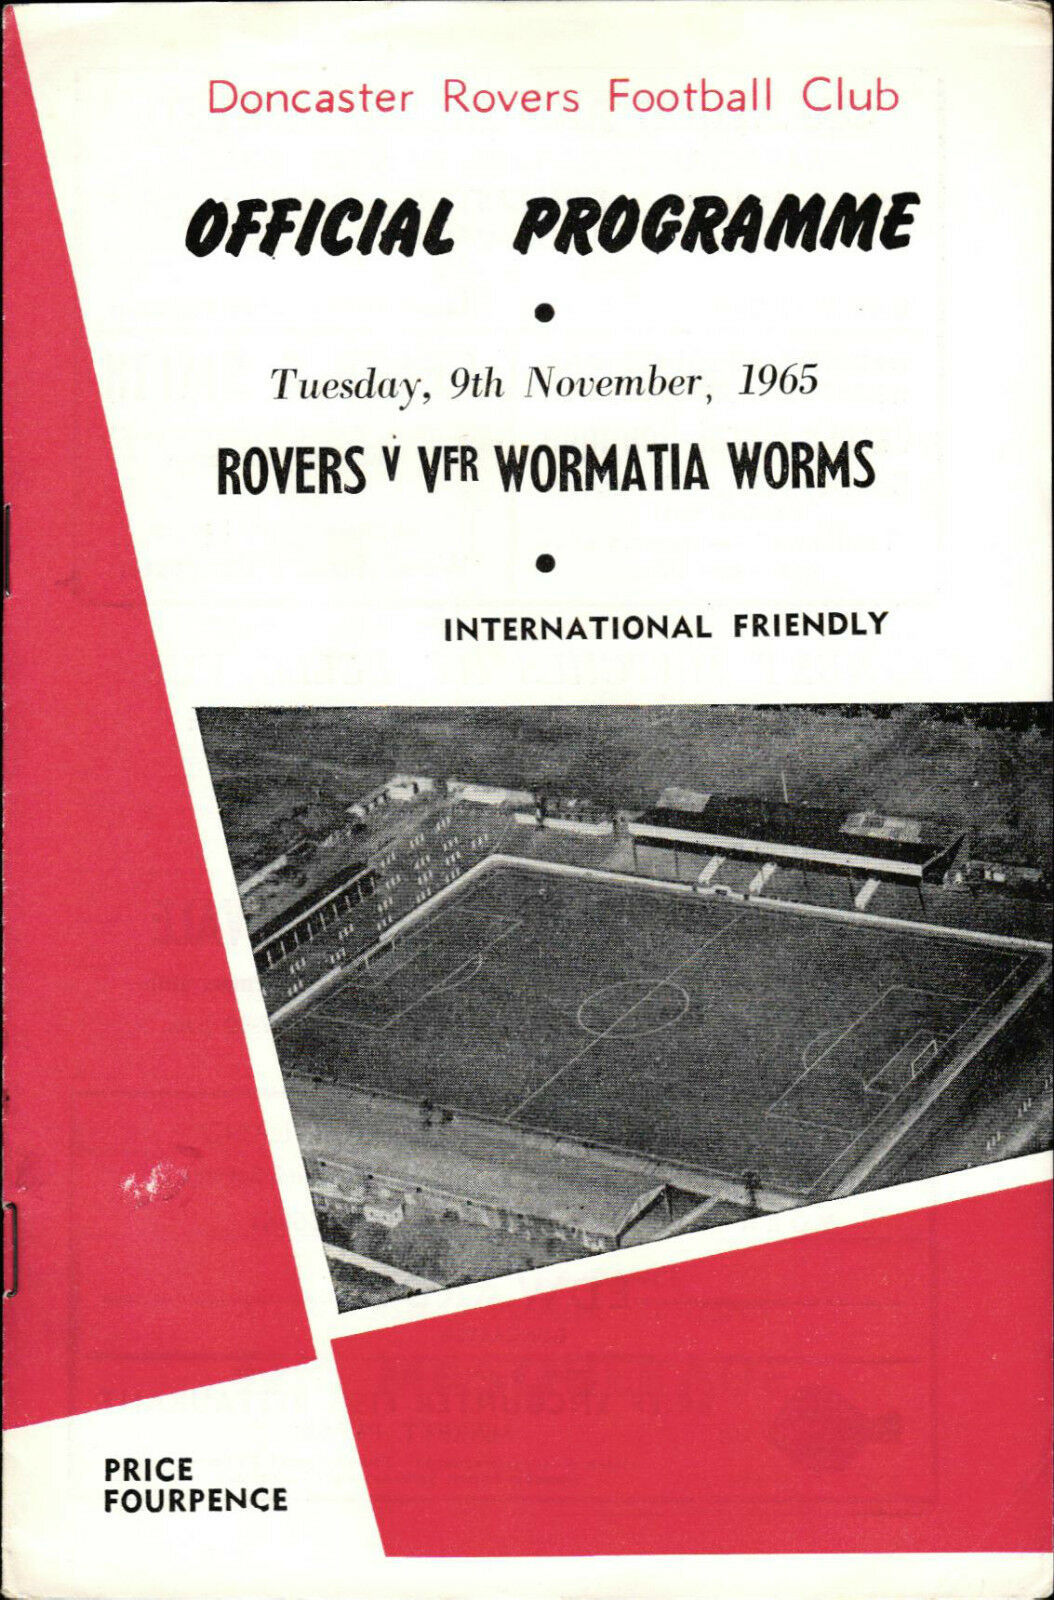 09.11.1965 Doncaster Wormatia Rovers pourC Wormatia Doncaster Worms b5913c